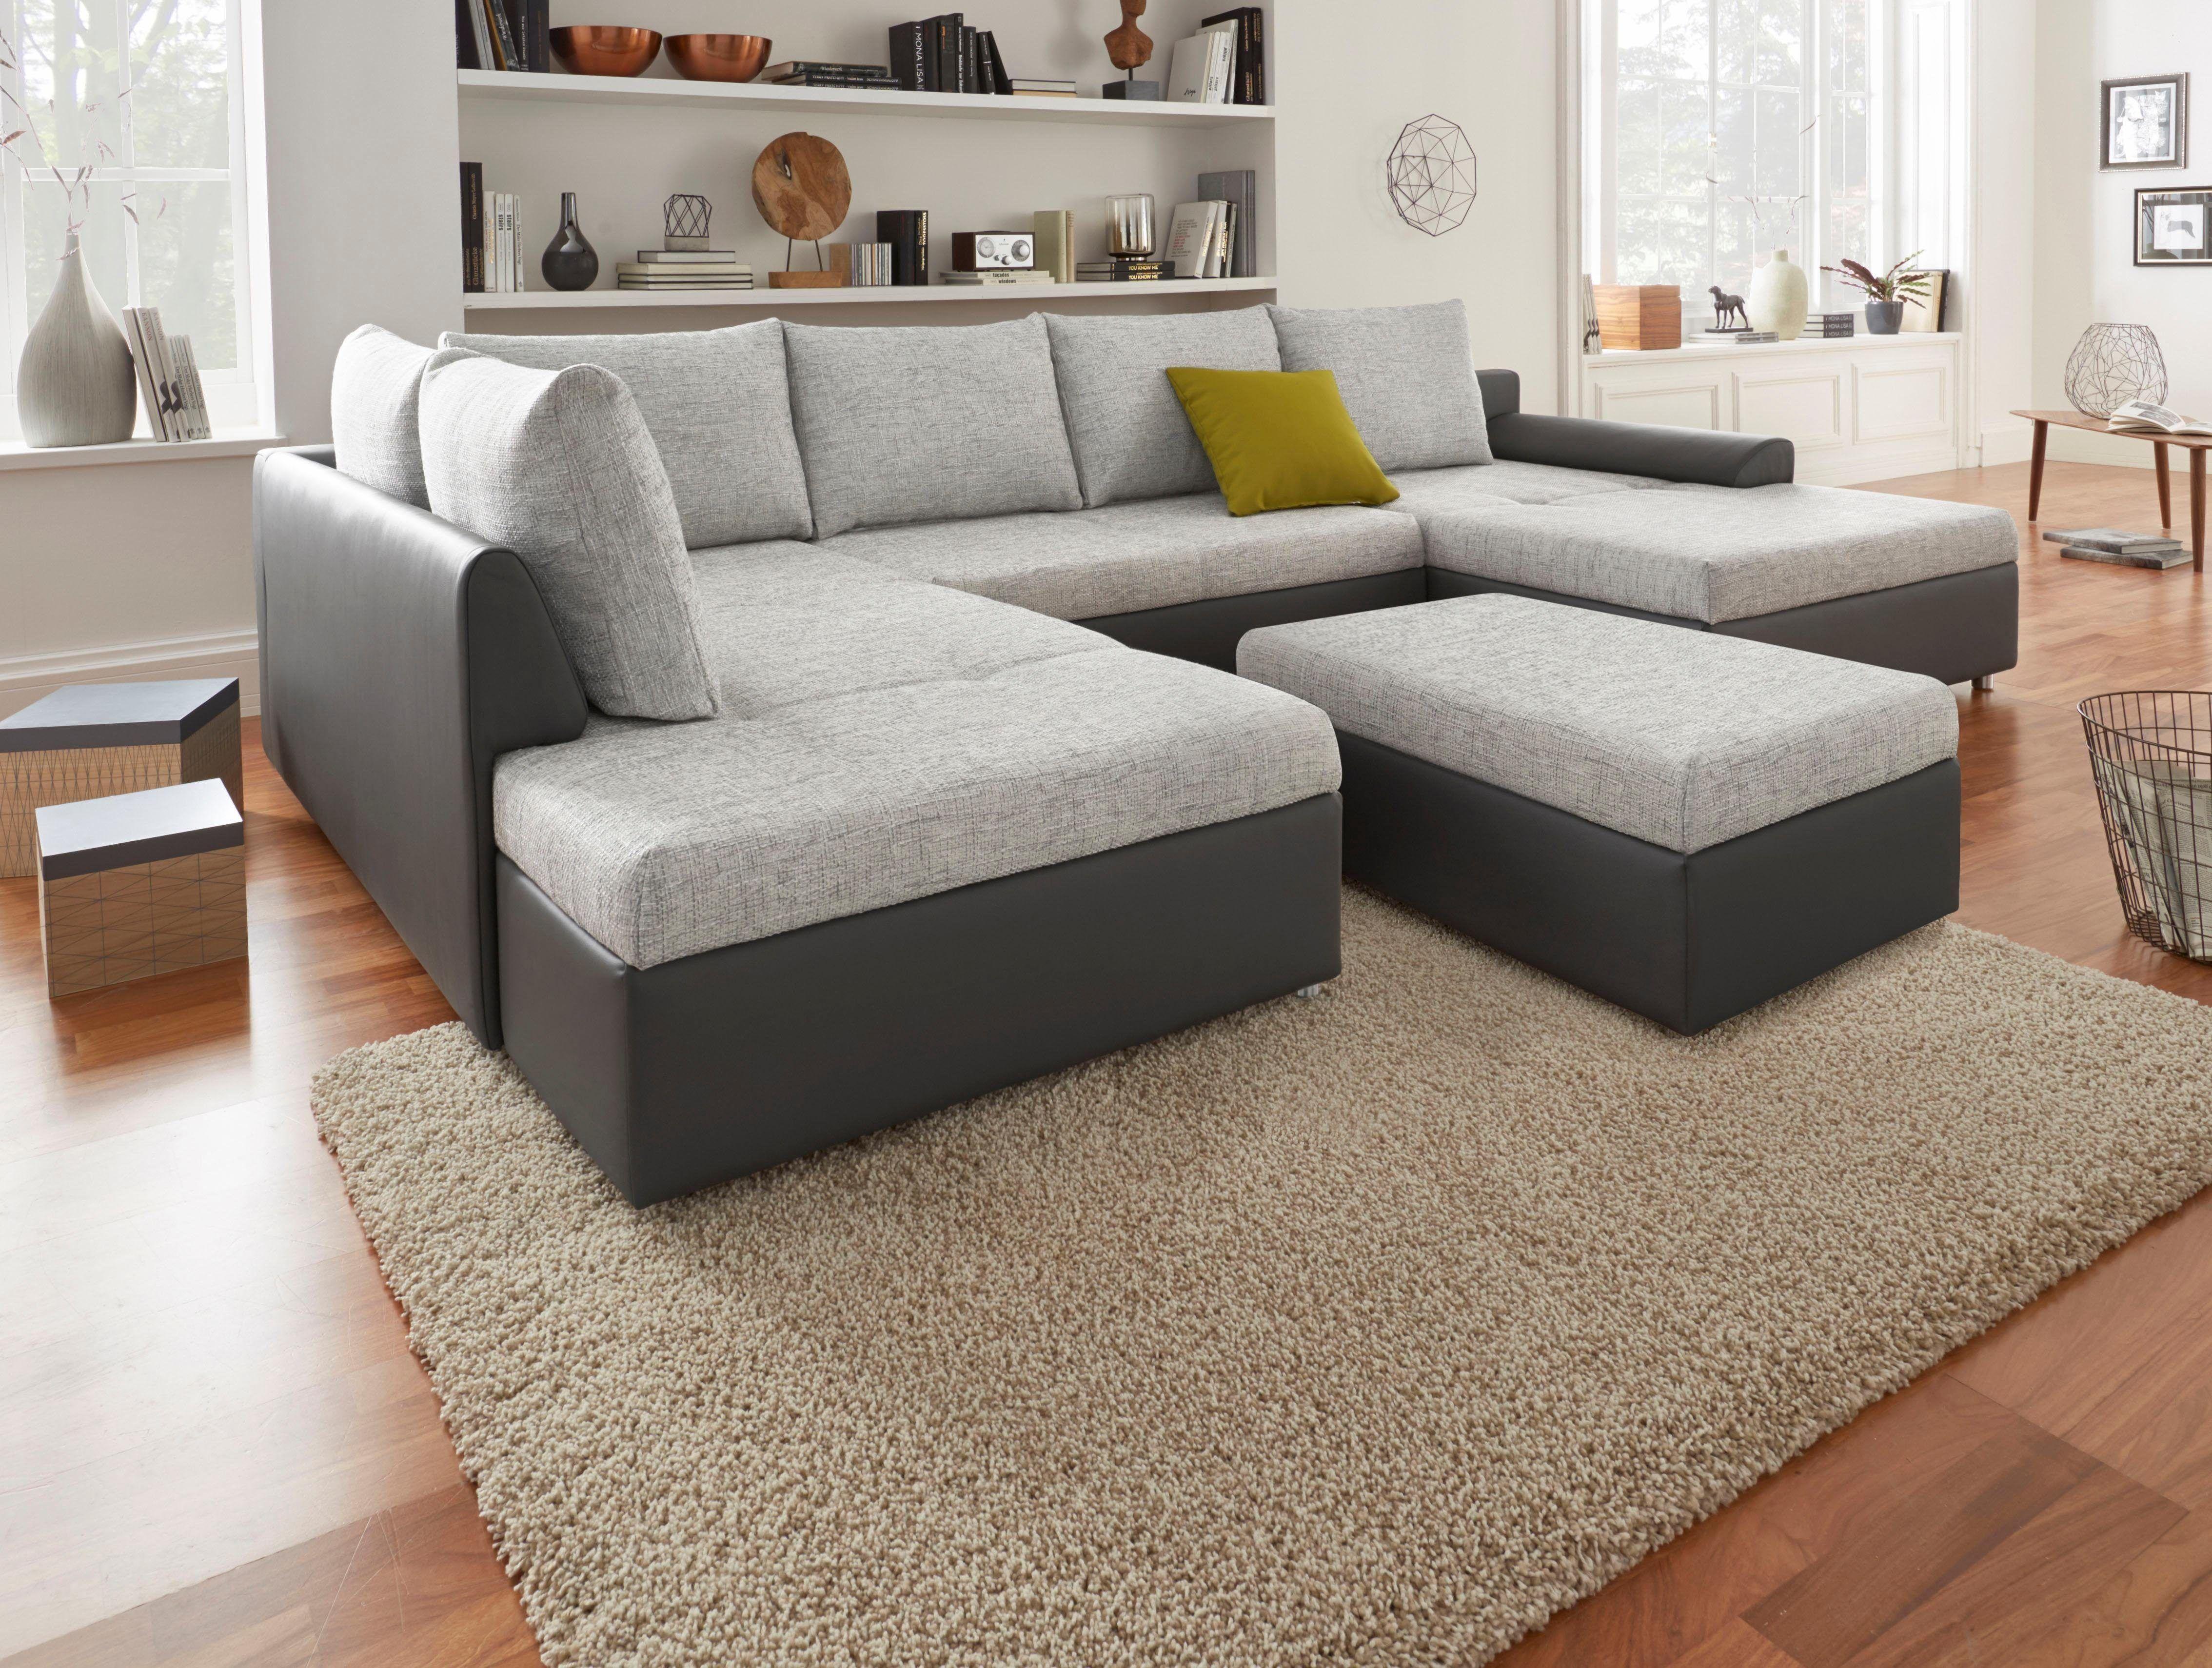 Top Ergebnis 50 Genial Graues sofa Ikea Grafiken 2017 Sjd8 2017